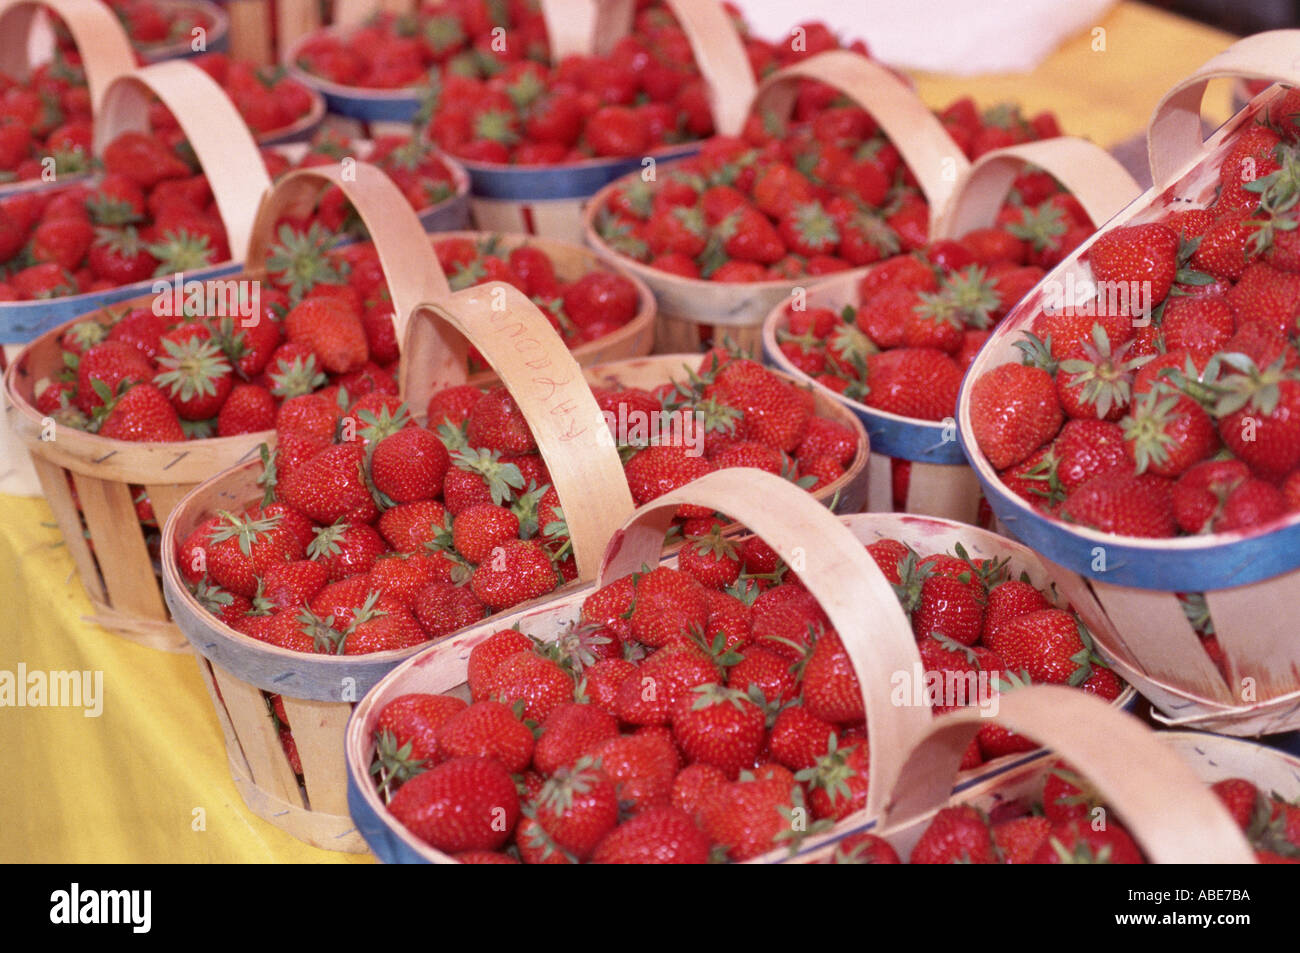 Market stall, Aix-en-Provence - Stock Image